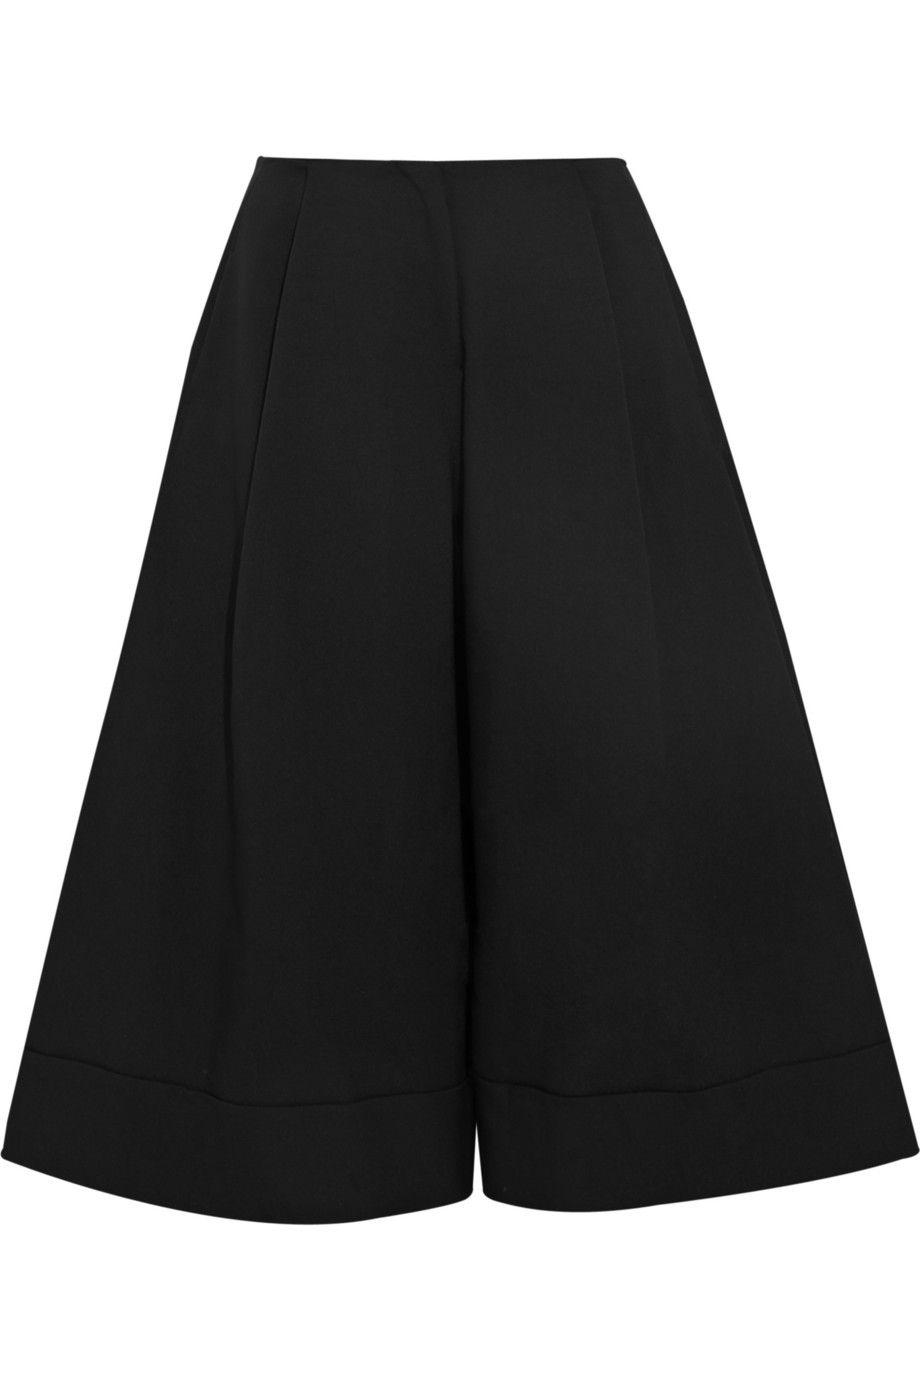 J.W.Anderson  Crepe wide-leg culottes NET-A-PORTER.COM